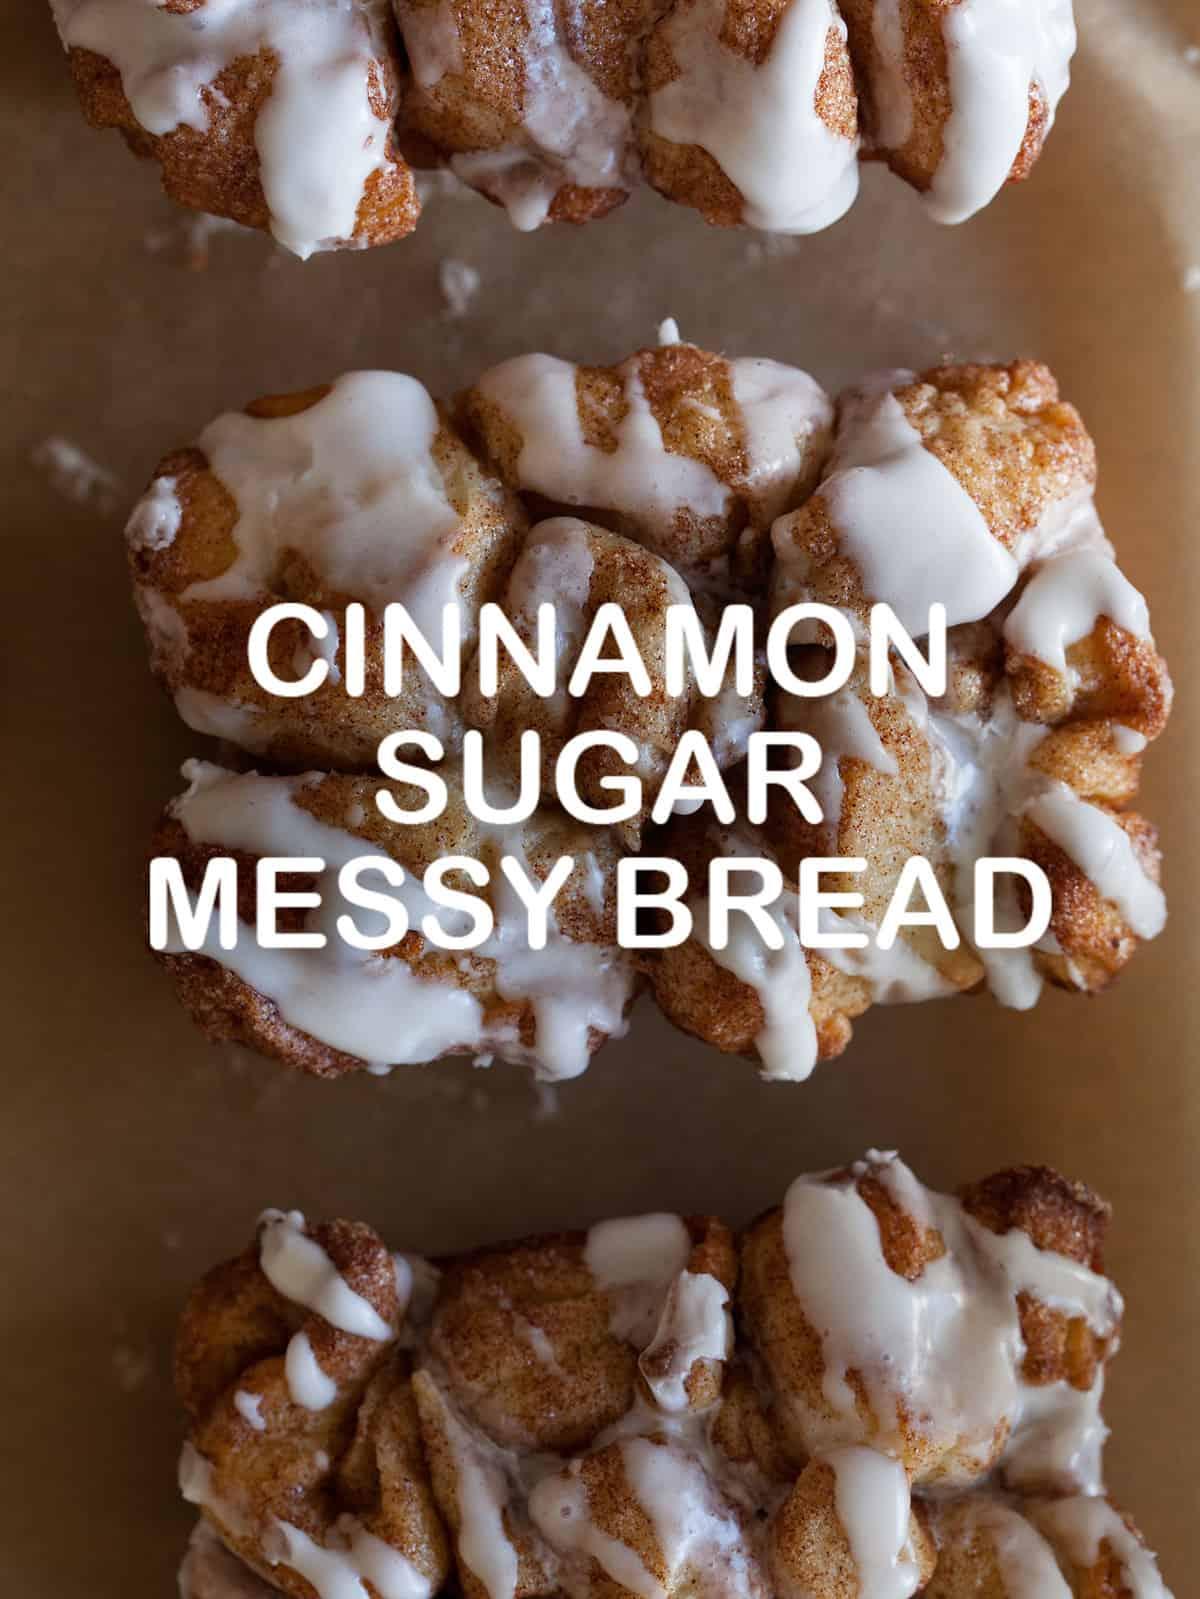 cinnamon sugar messy bread dessert recipe spoon fork bacon